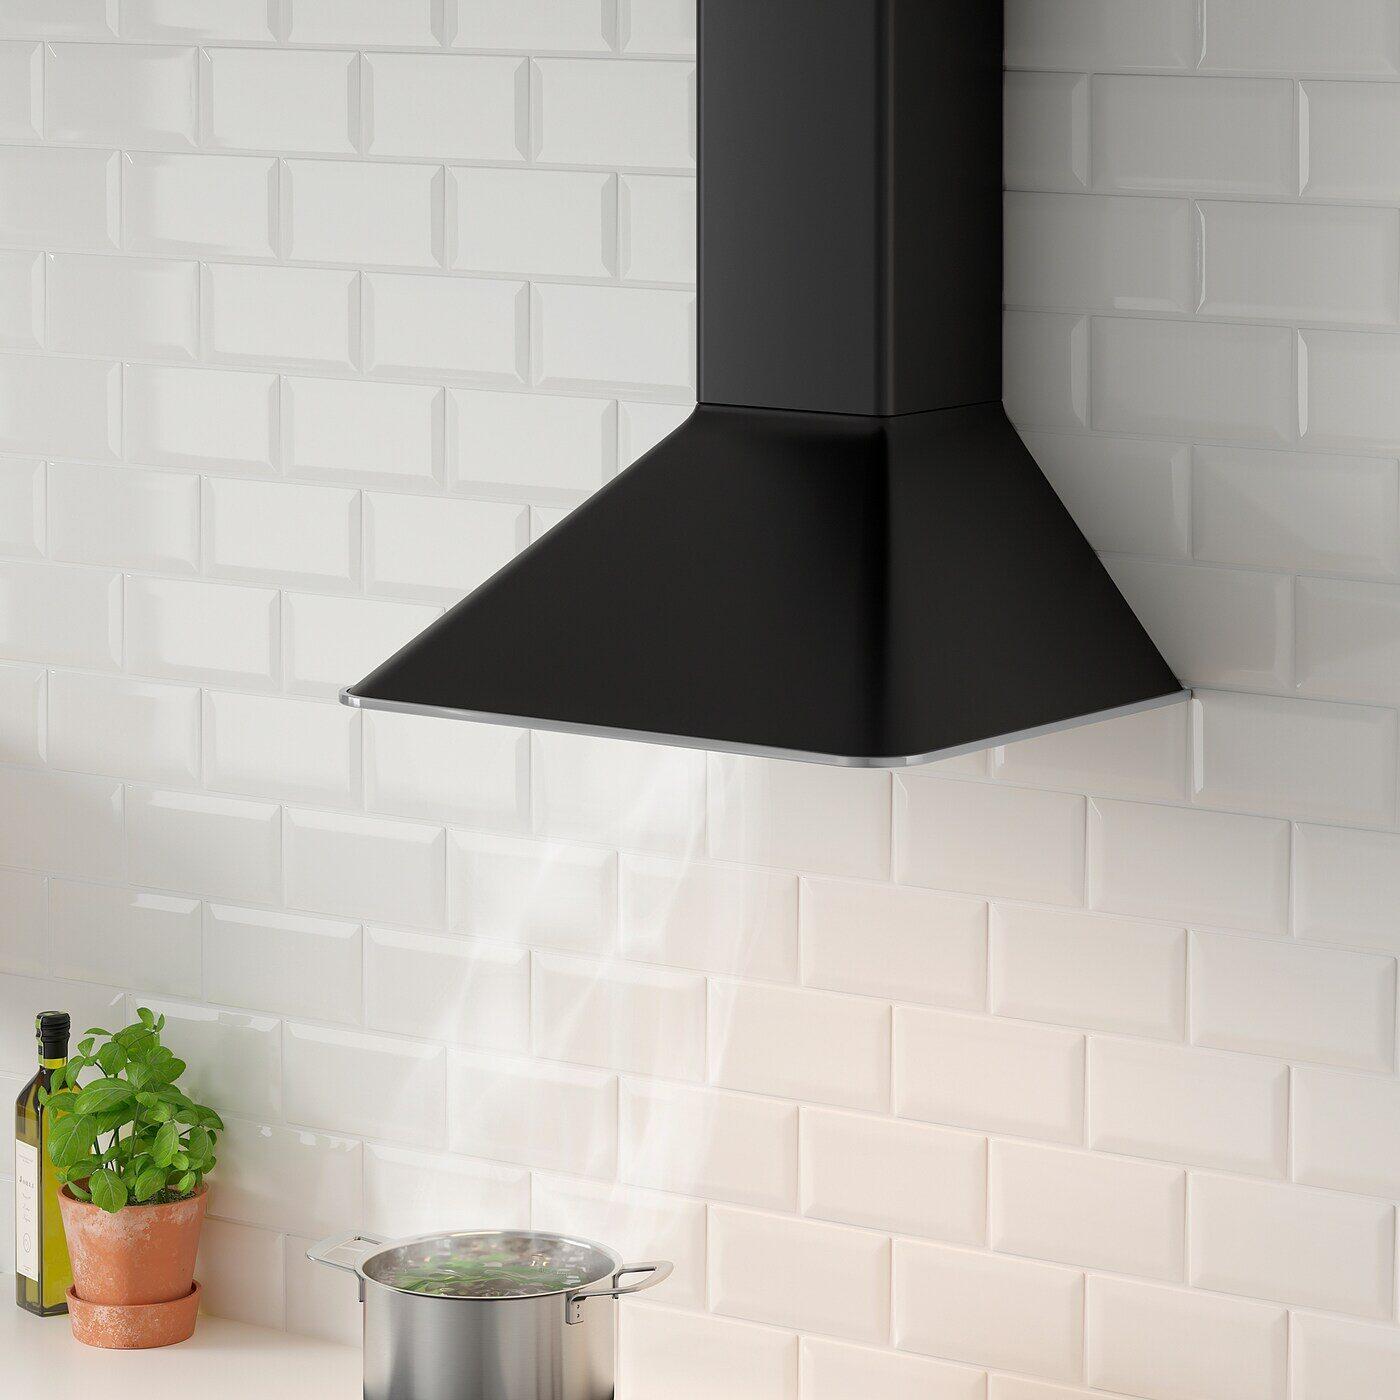 mattradition-wall-mounted-extractor-hood-black__0868313_pe673341_s5